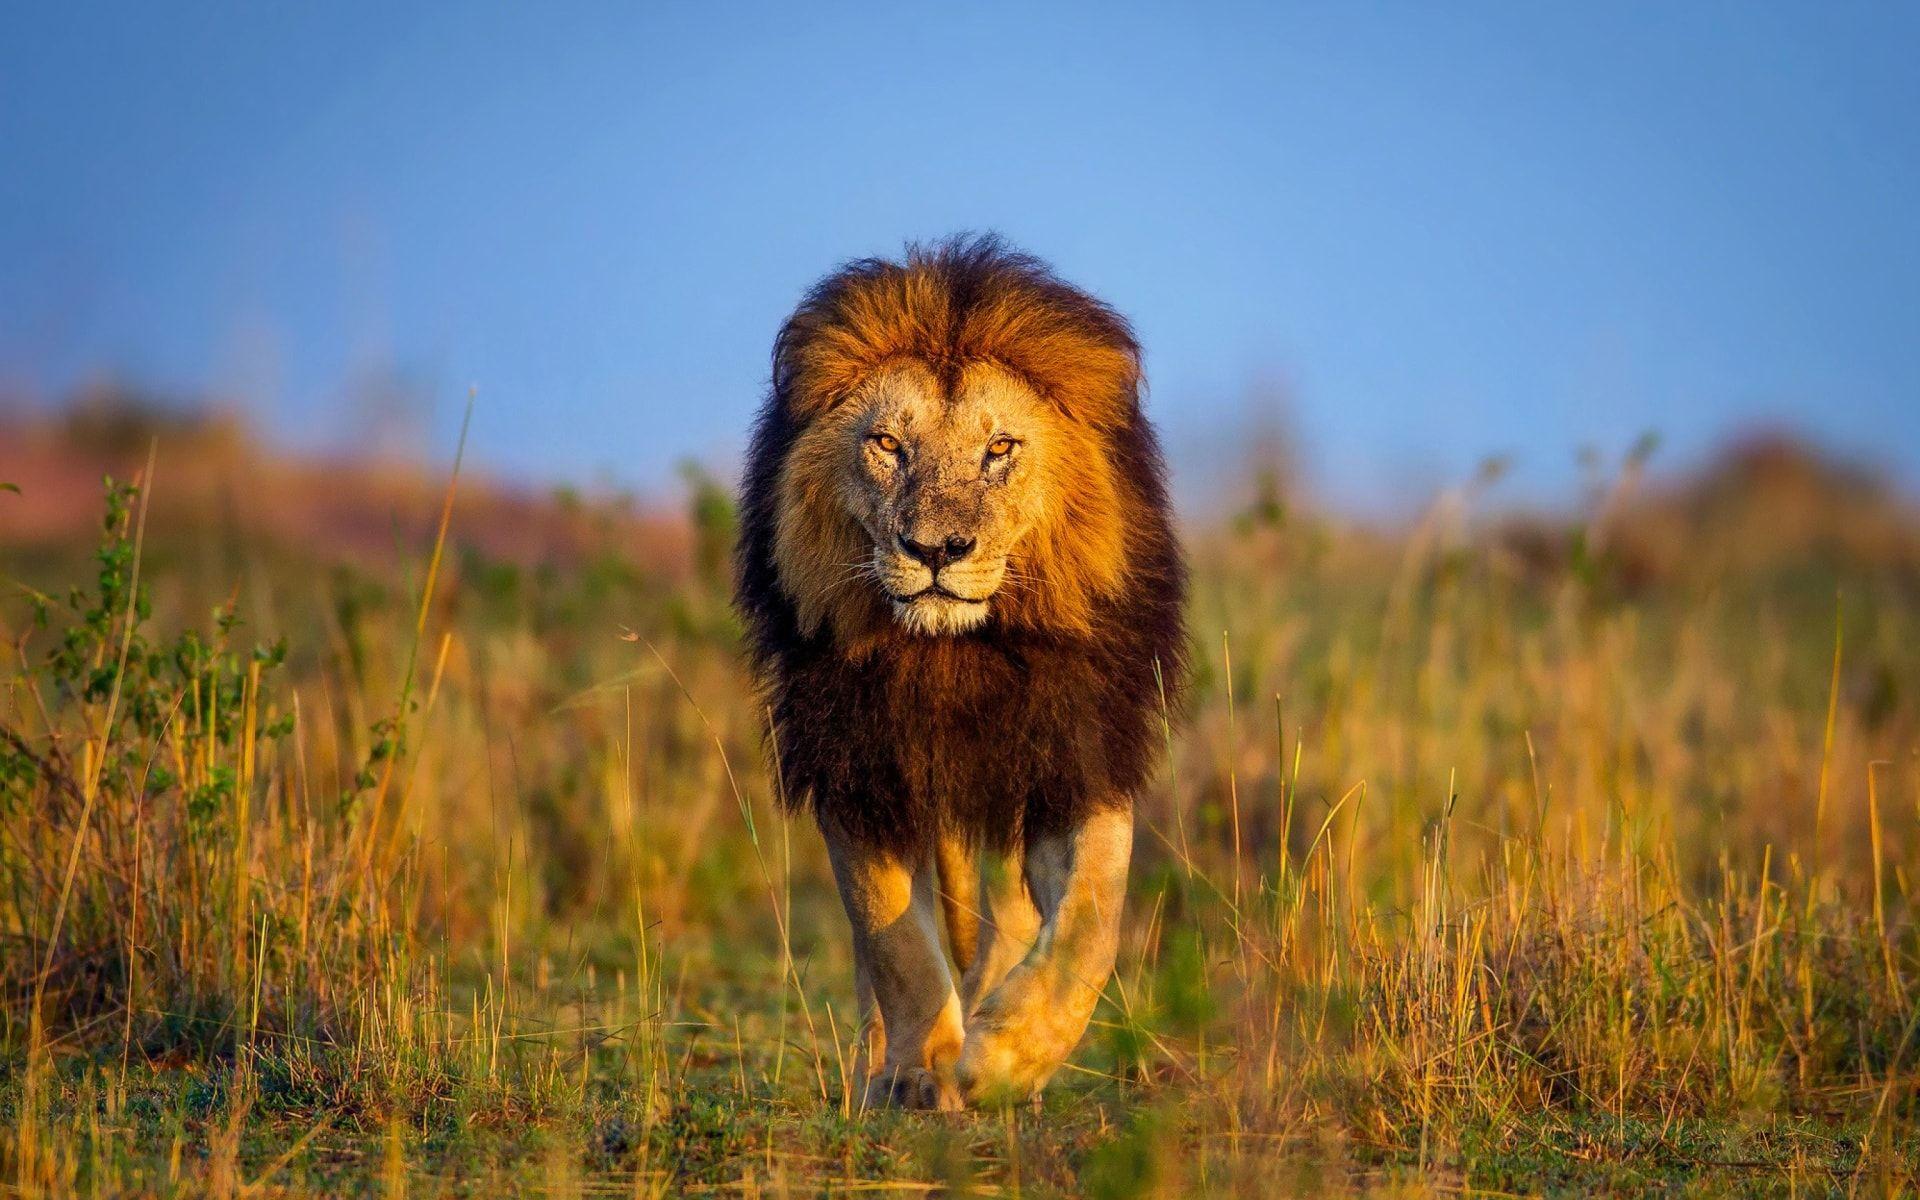 Best 25 Lion Hd Wallpaper Ideas On Pinterest: Cool Lion Wallpapers HD Wallpapers Pinterest Lion